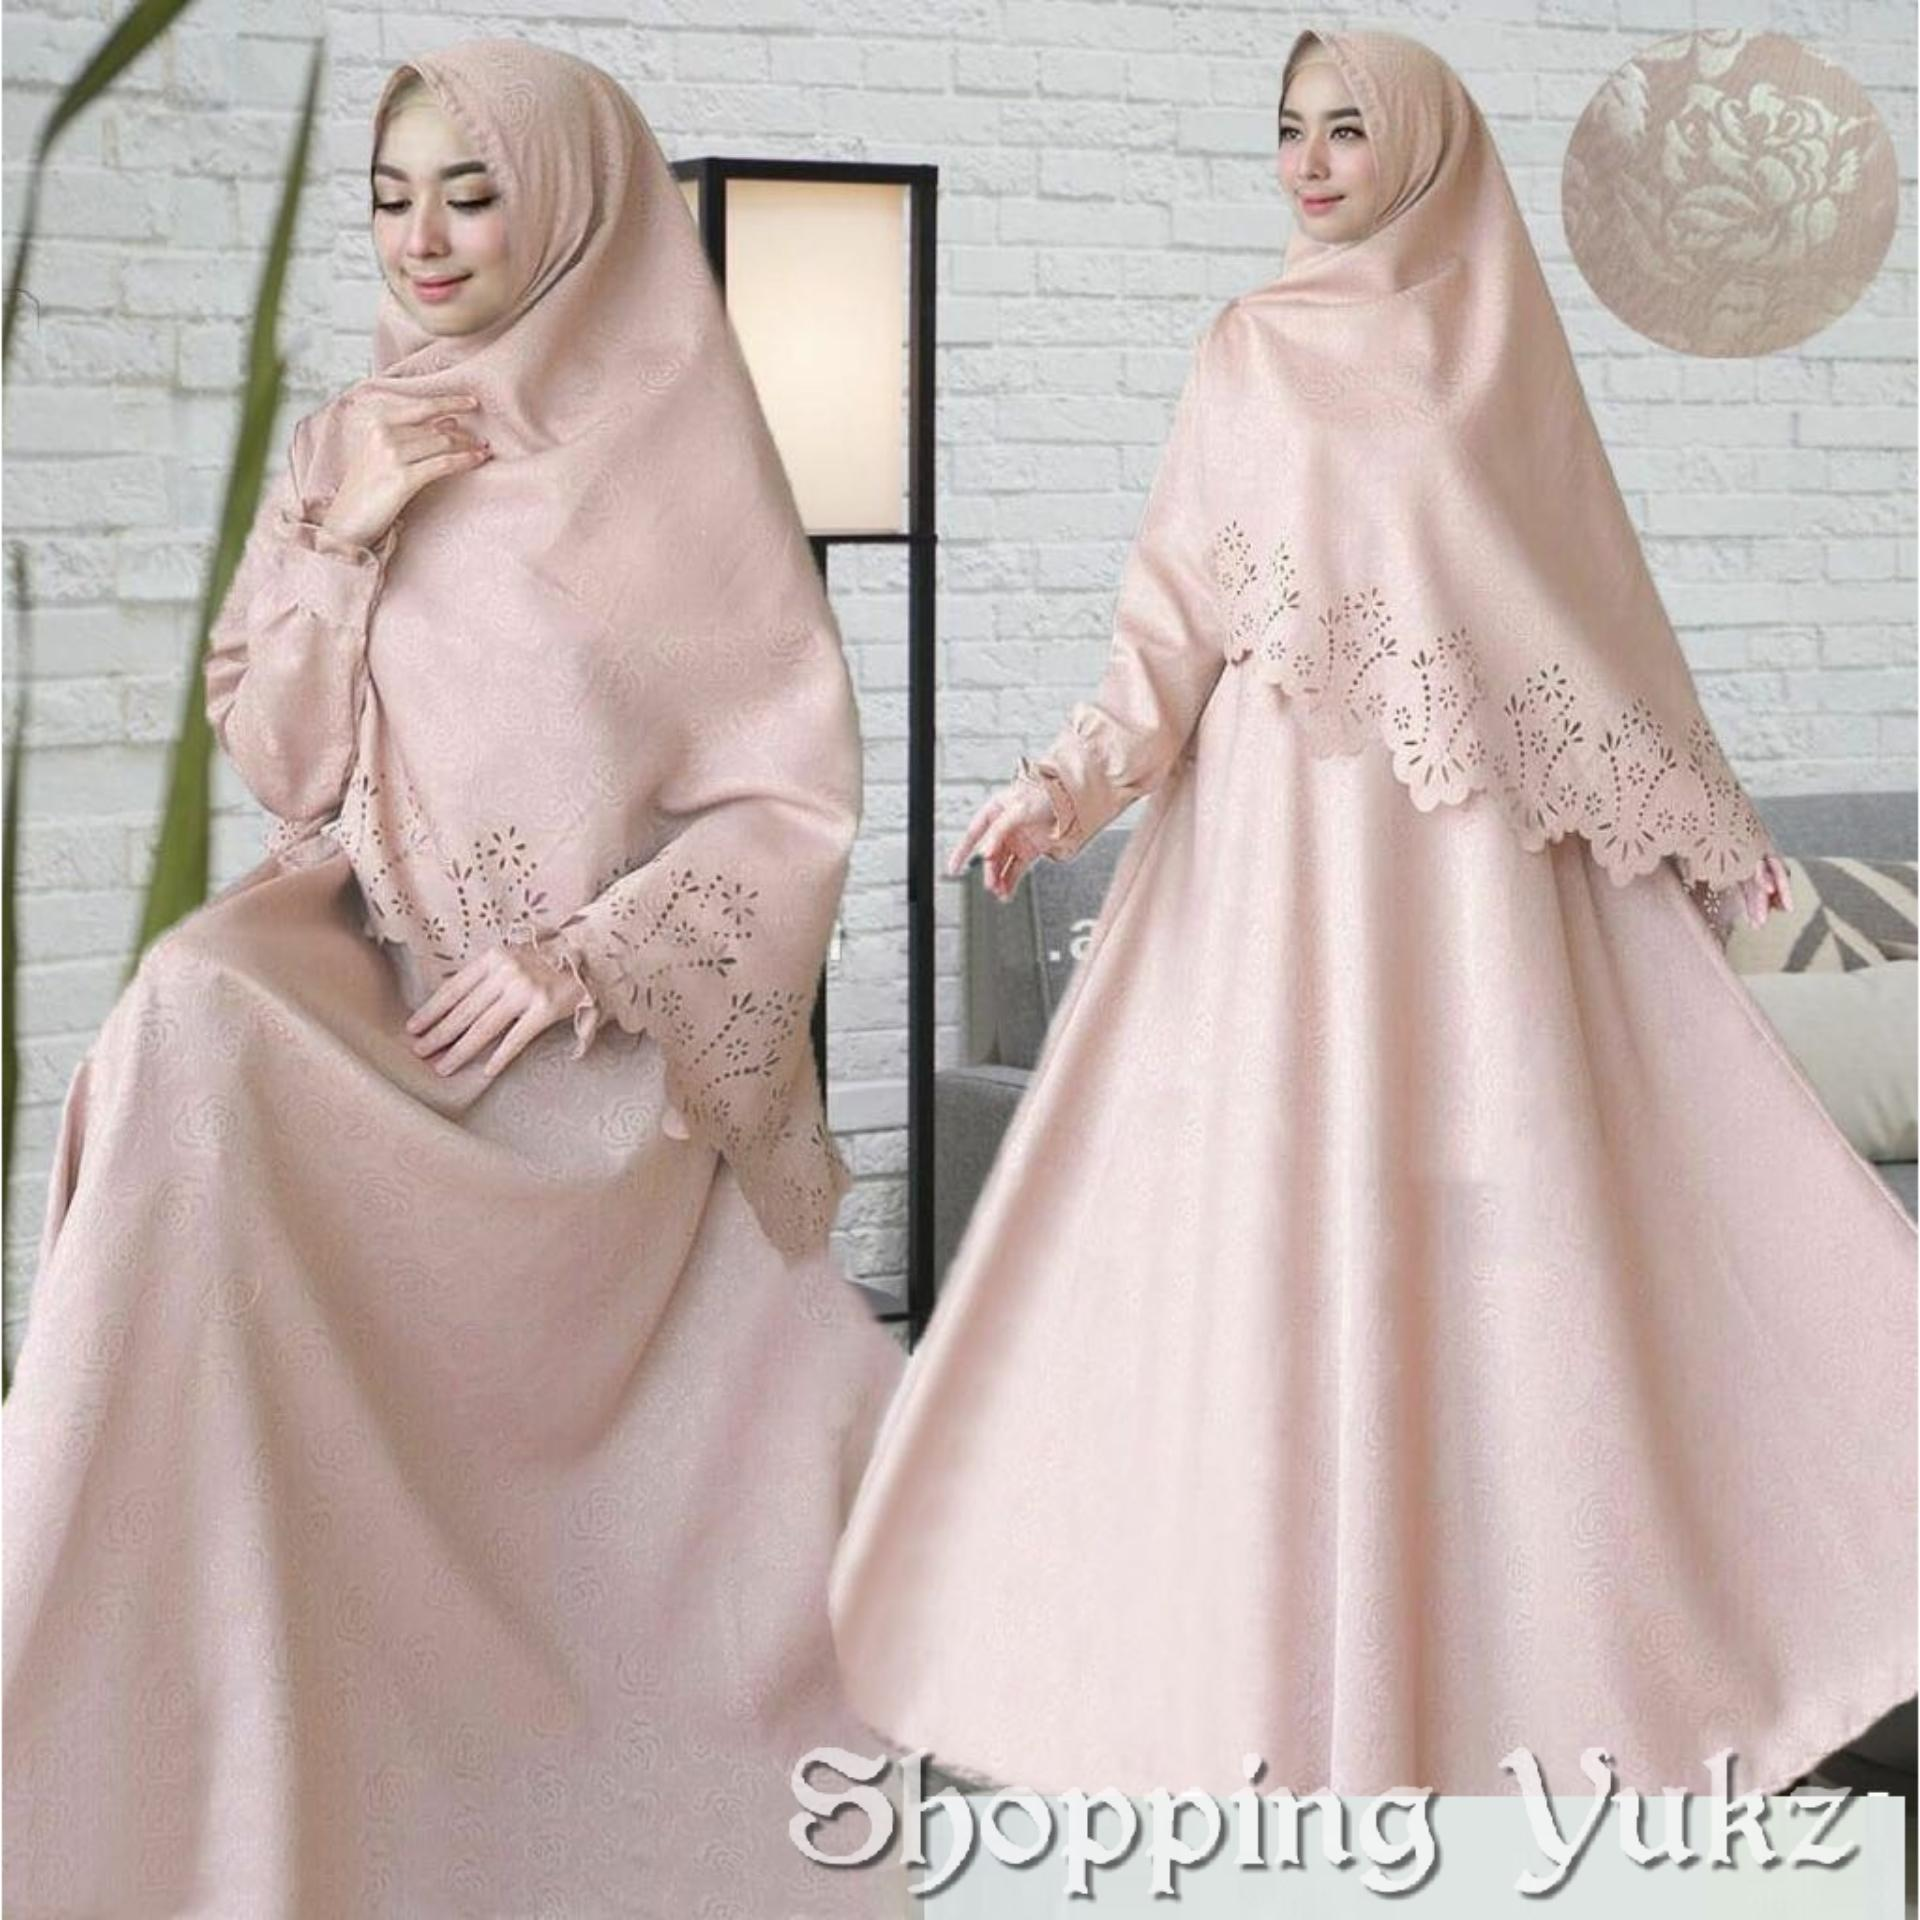 Shopping Yukz Baju Gamis Dress Muslim Syari Wanita RESYIA Emboss Laser LATTE Dapat